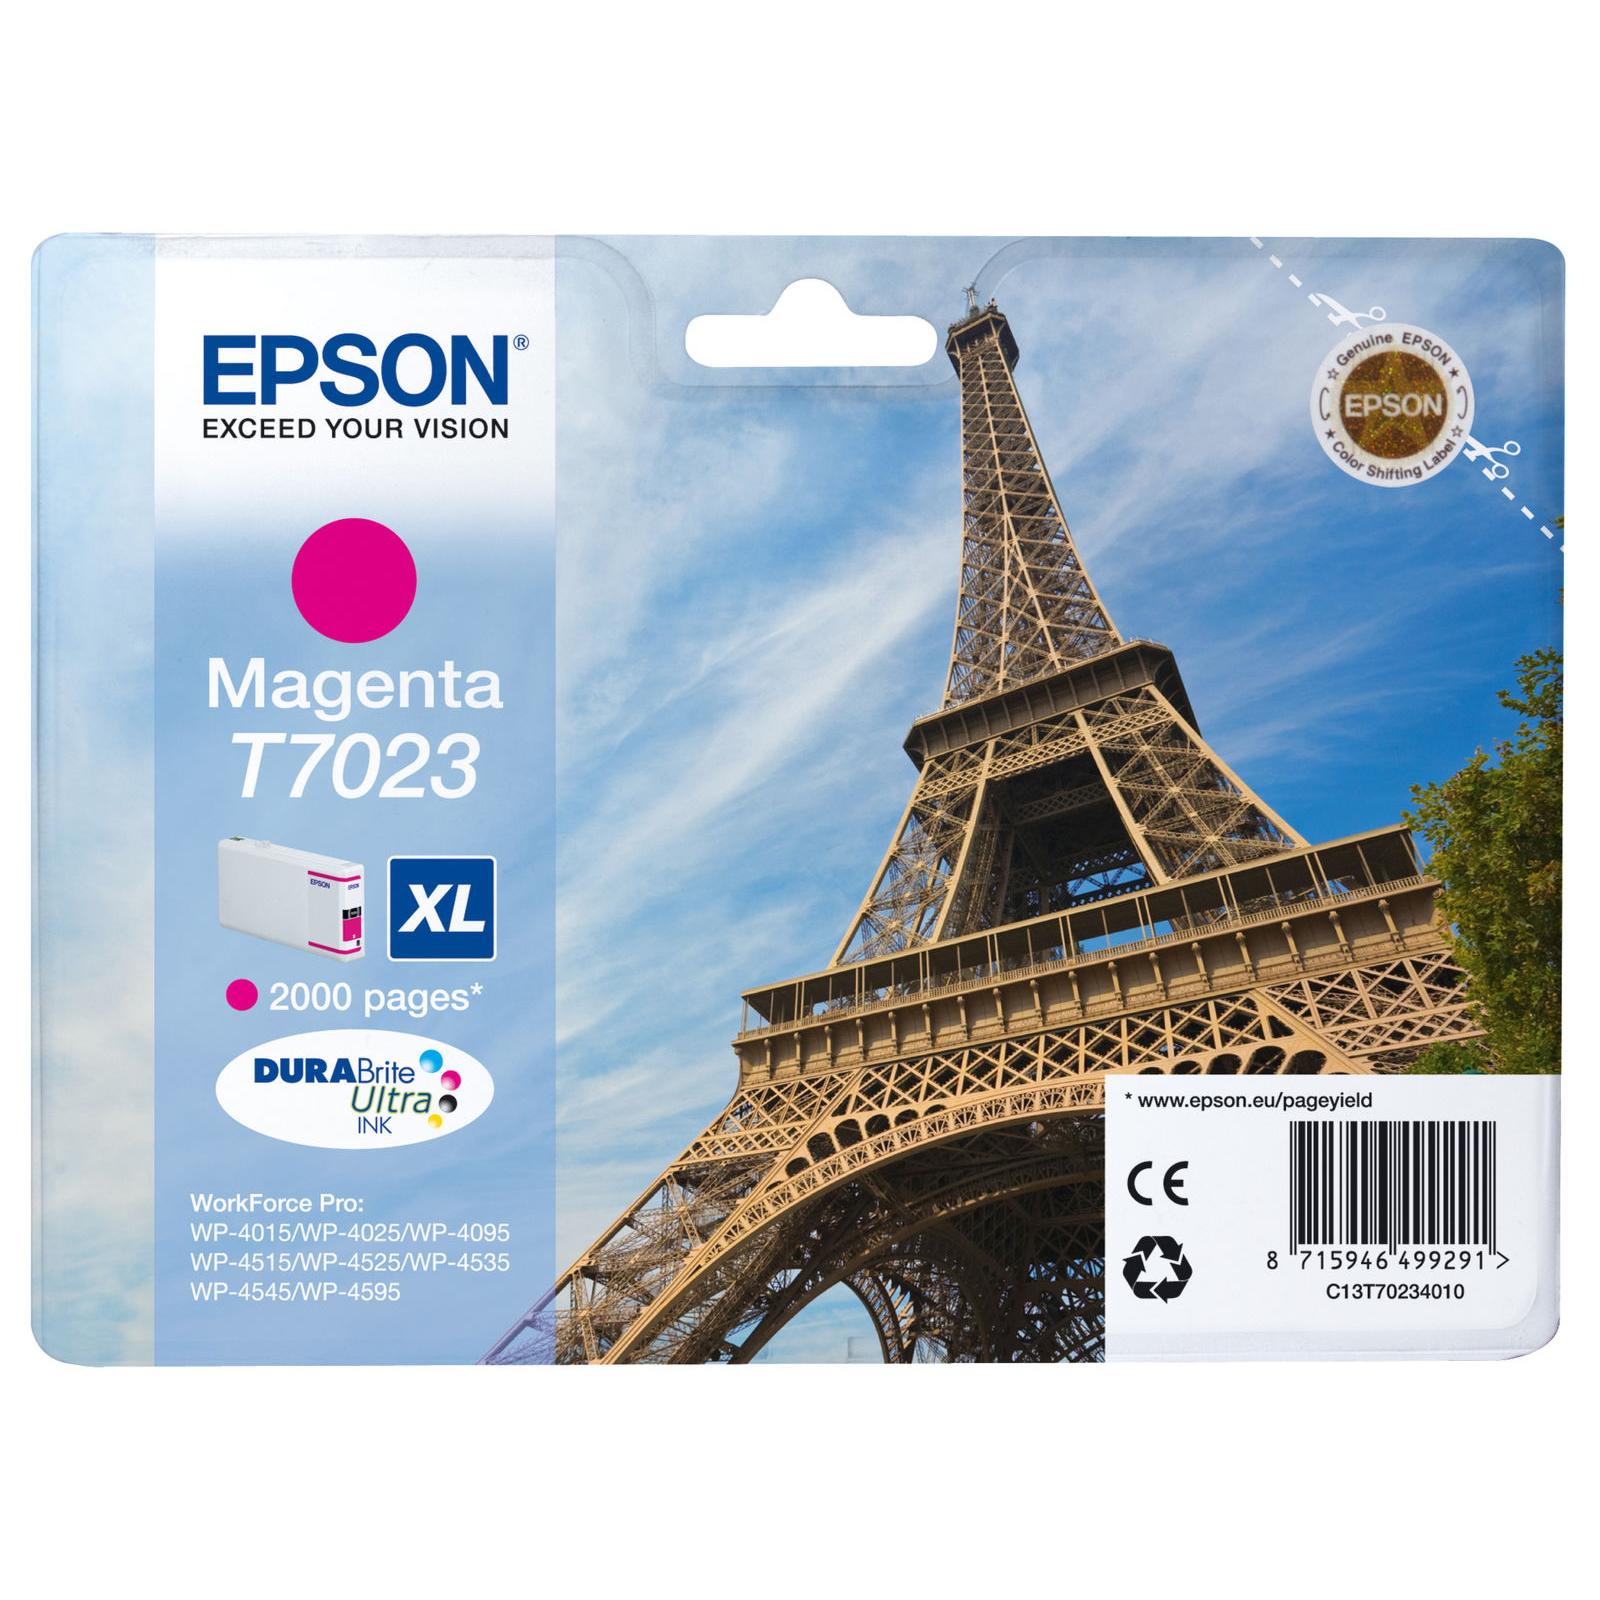 Epson T7023 XL Ink Cartridge - Magenta